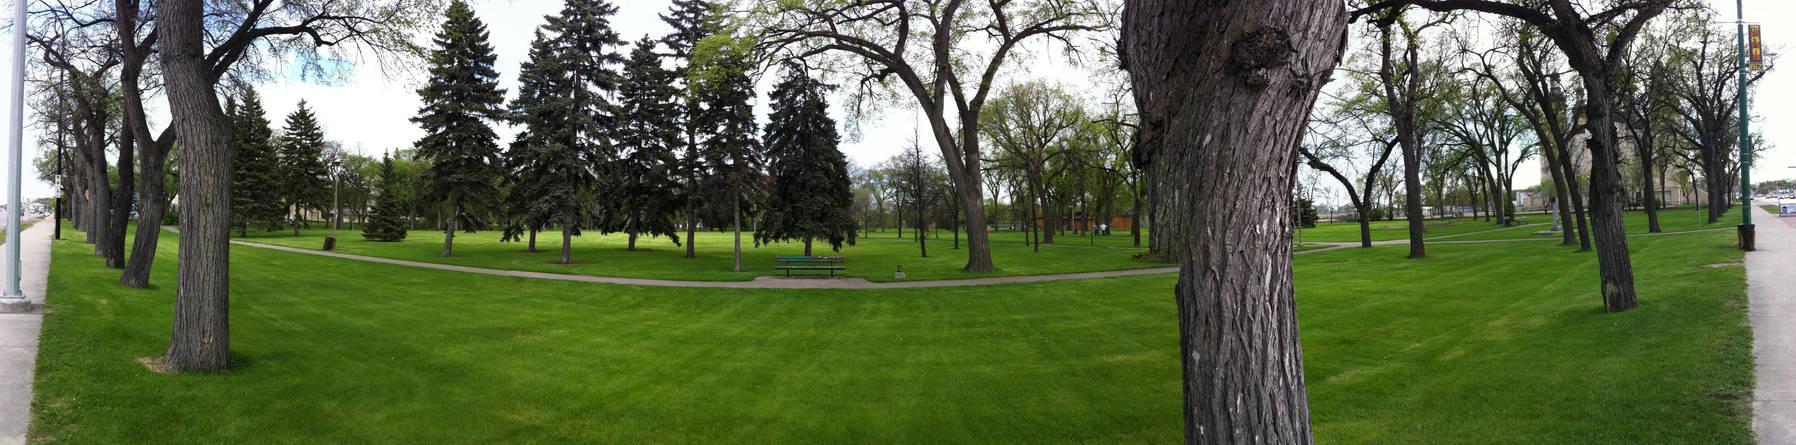 St. Johns Park Panorama